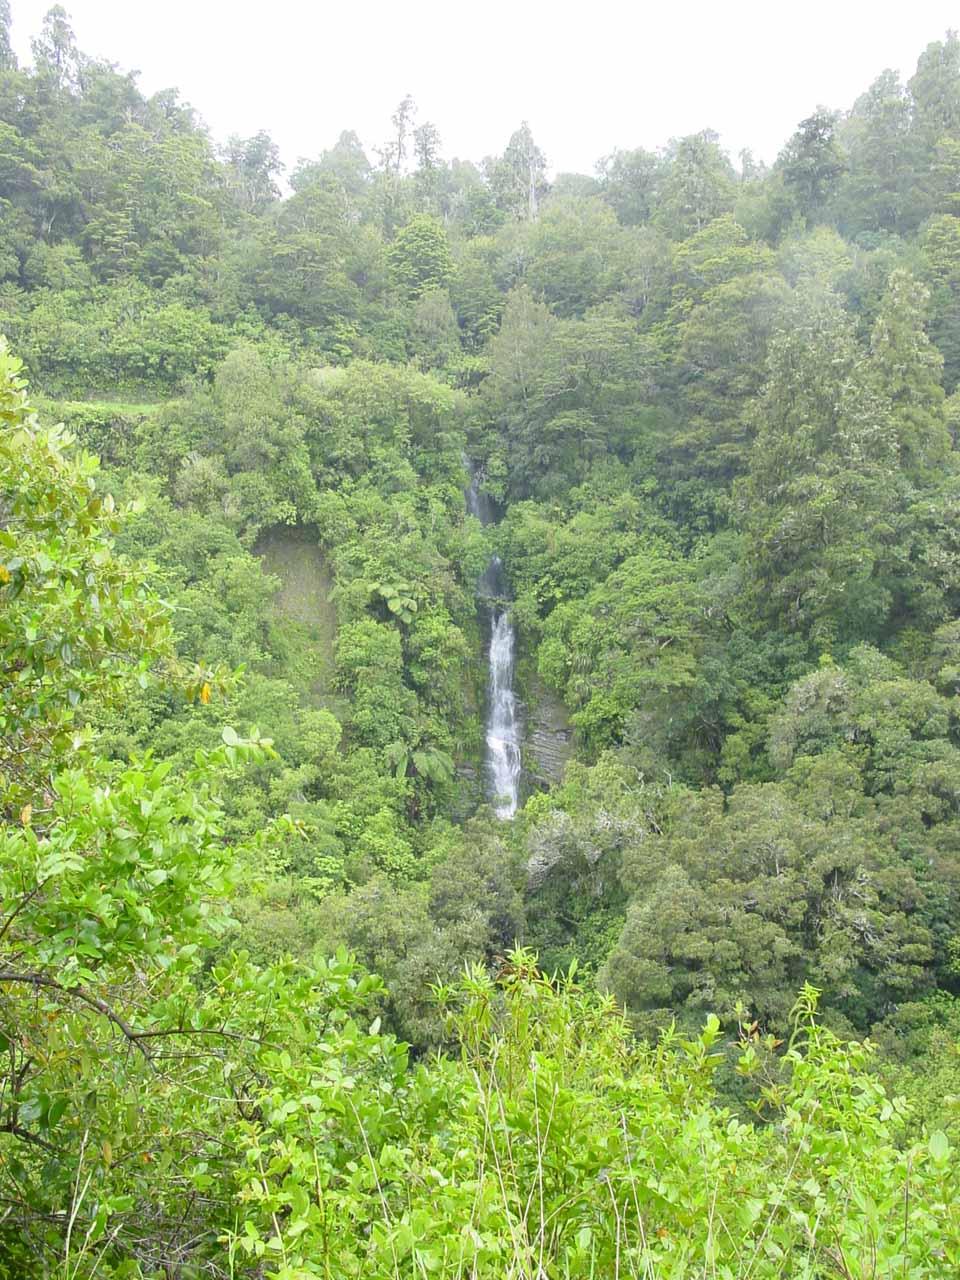 Looking back towards Tauwhare Falls